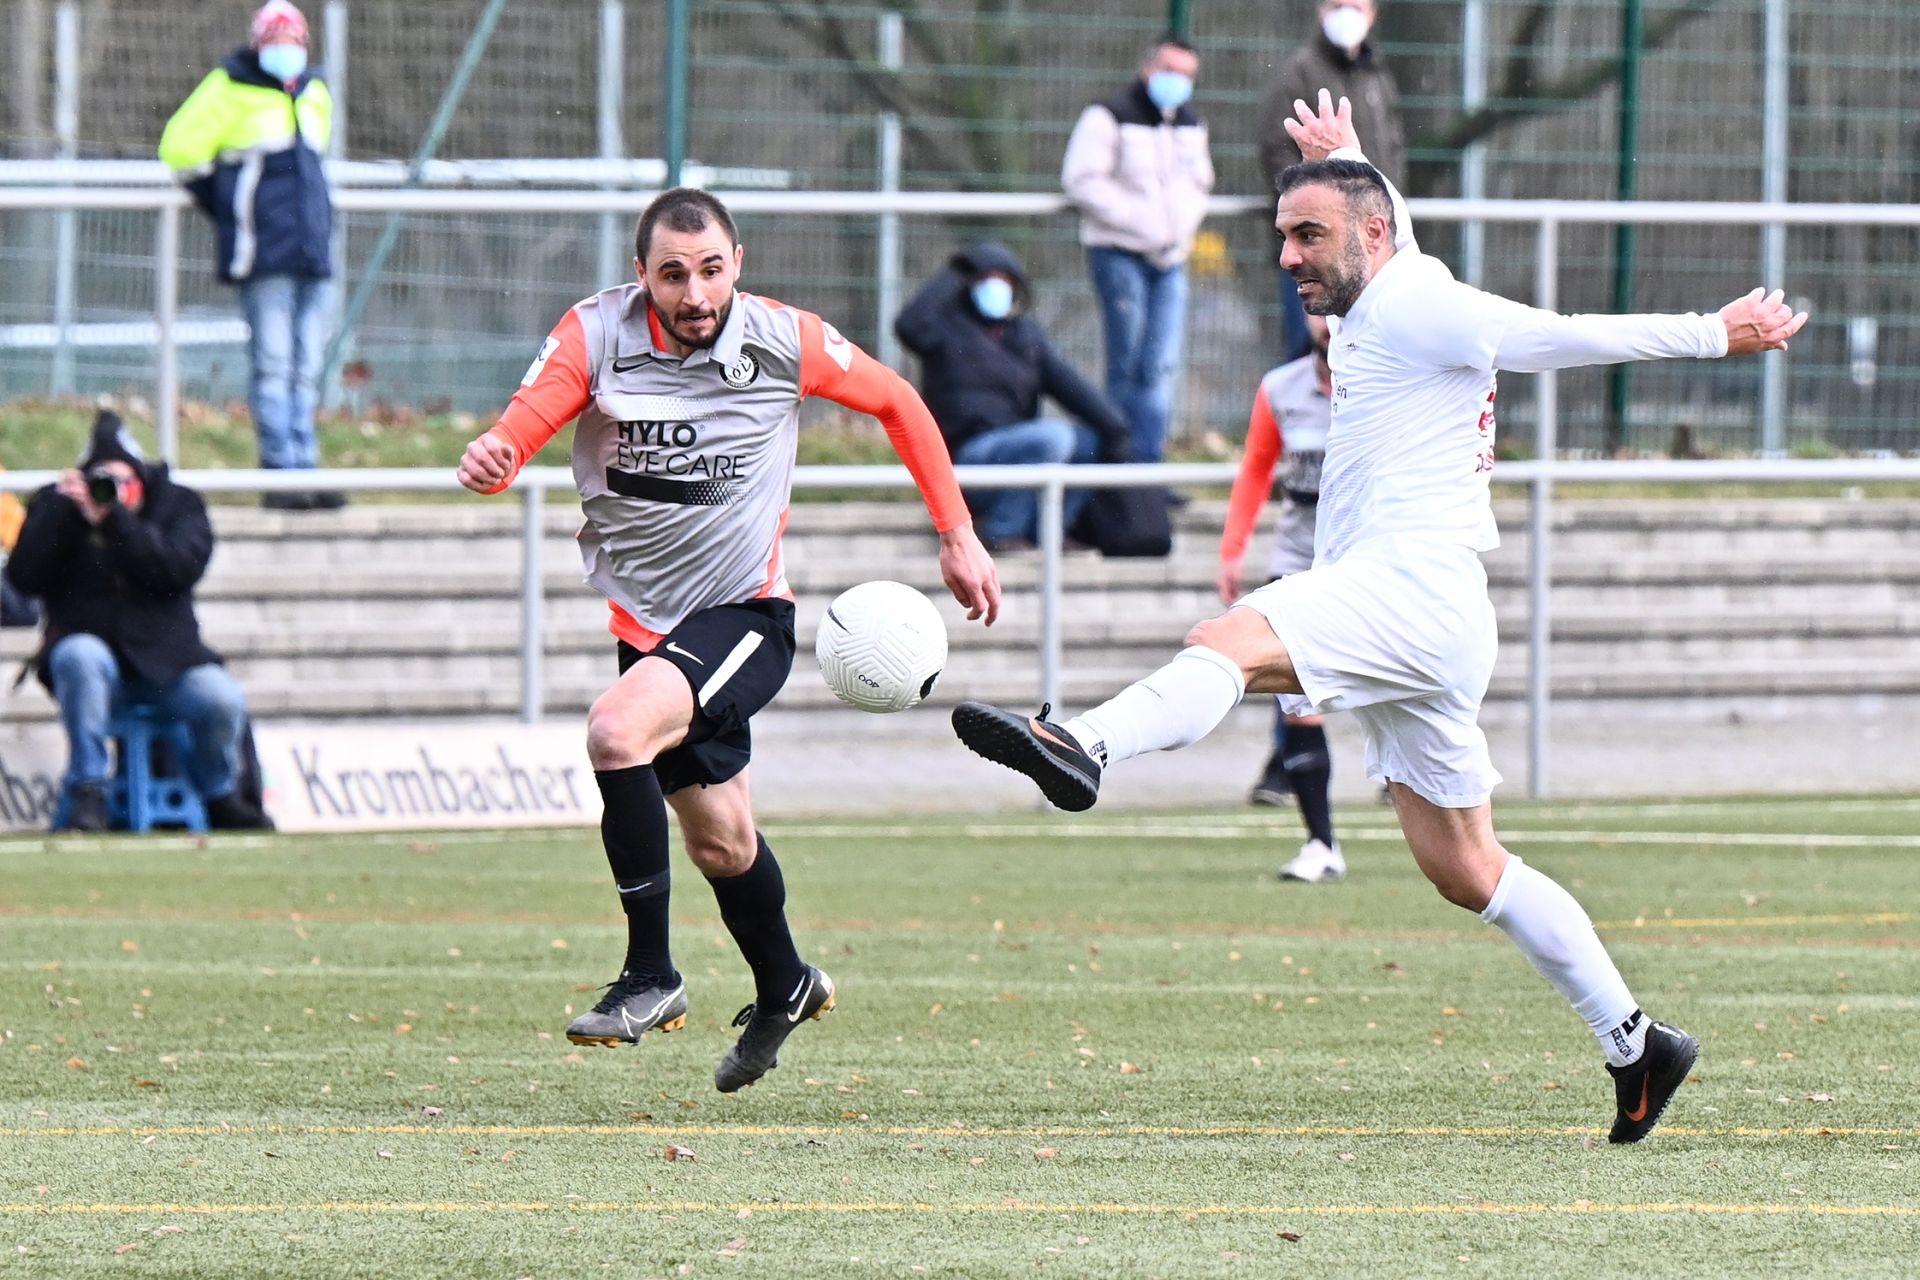 Regionalliga S�dwest 2020/21, KSV Hessen Kassel, SV Elversberg, Endstand 0:2